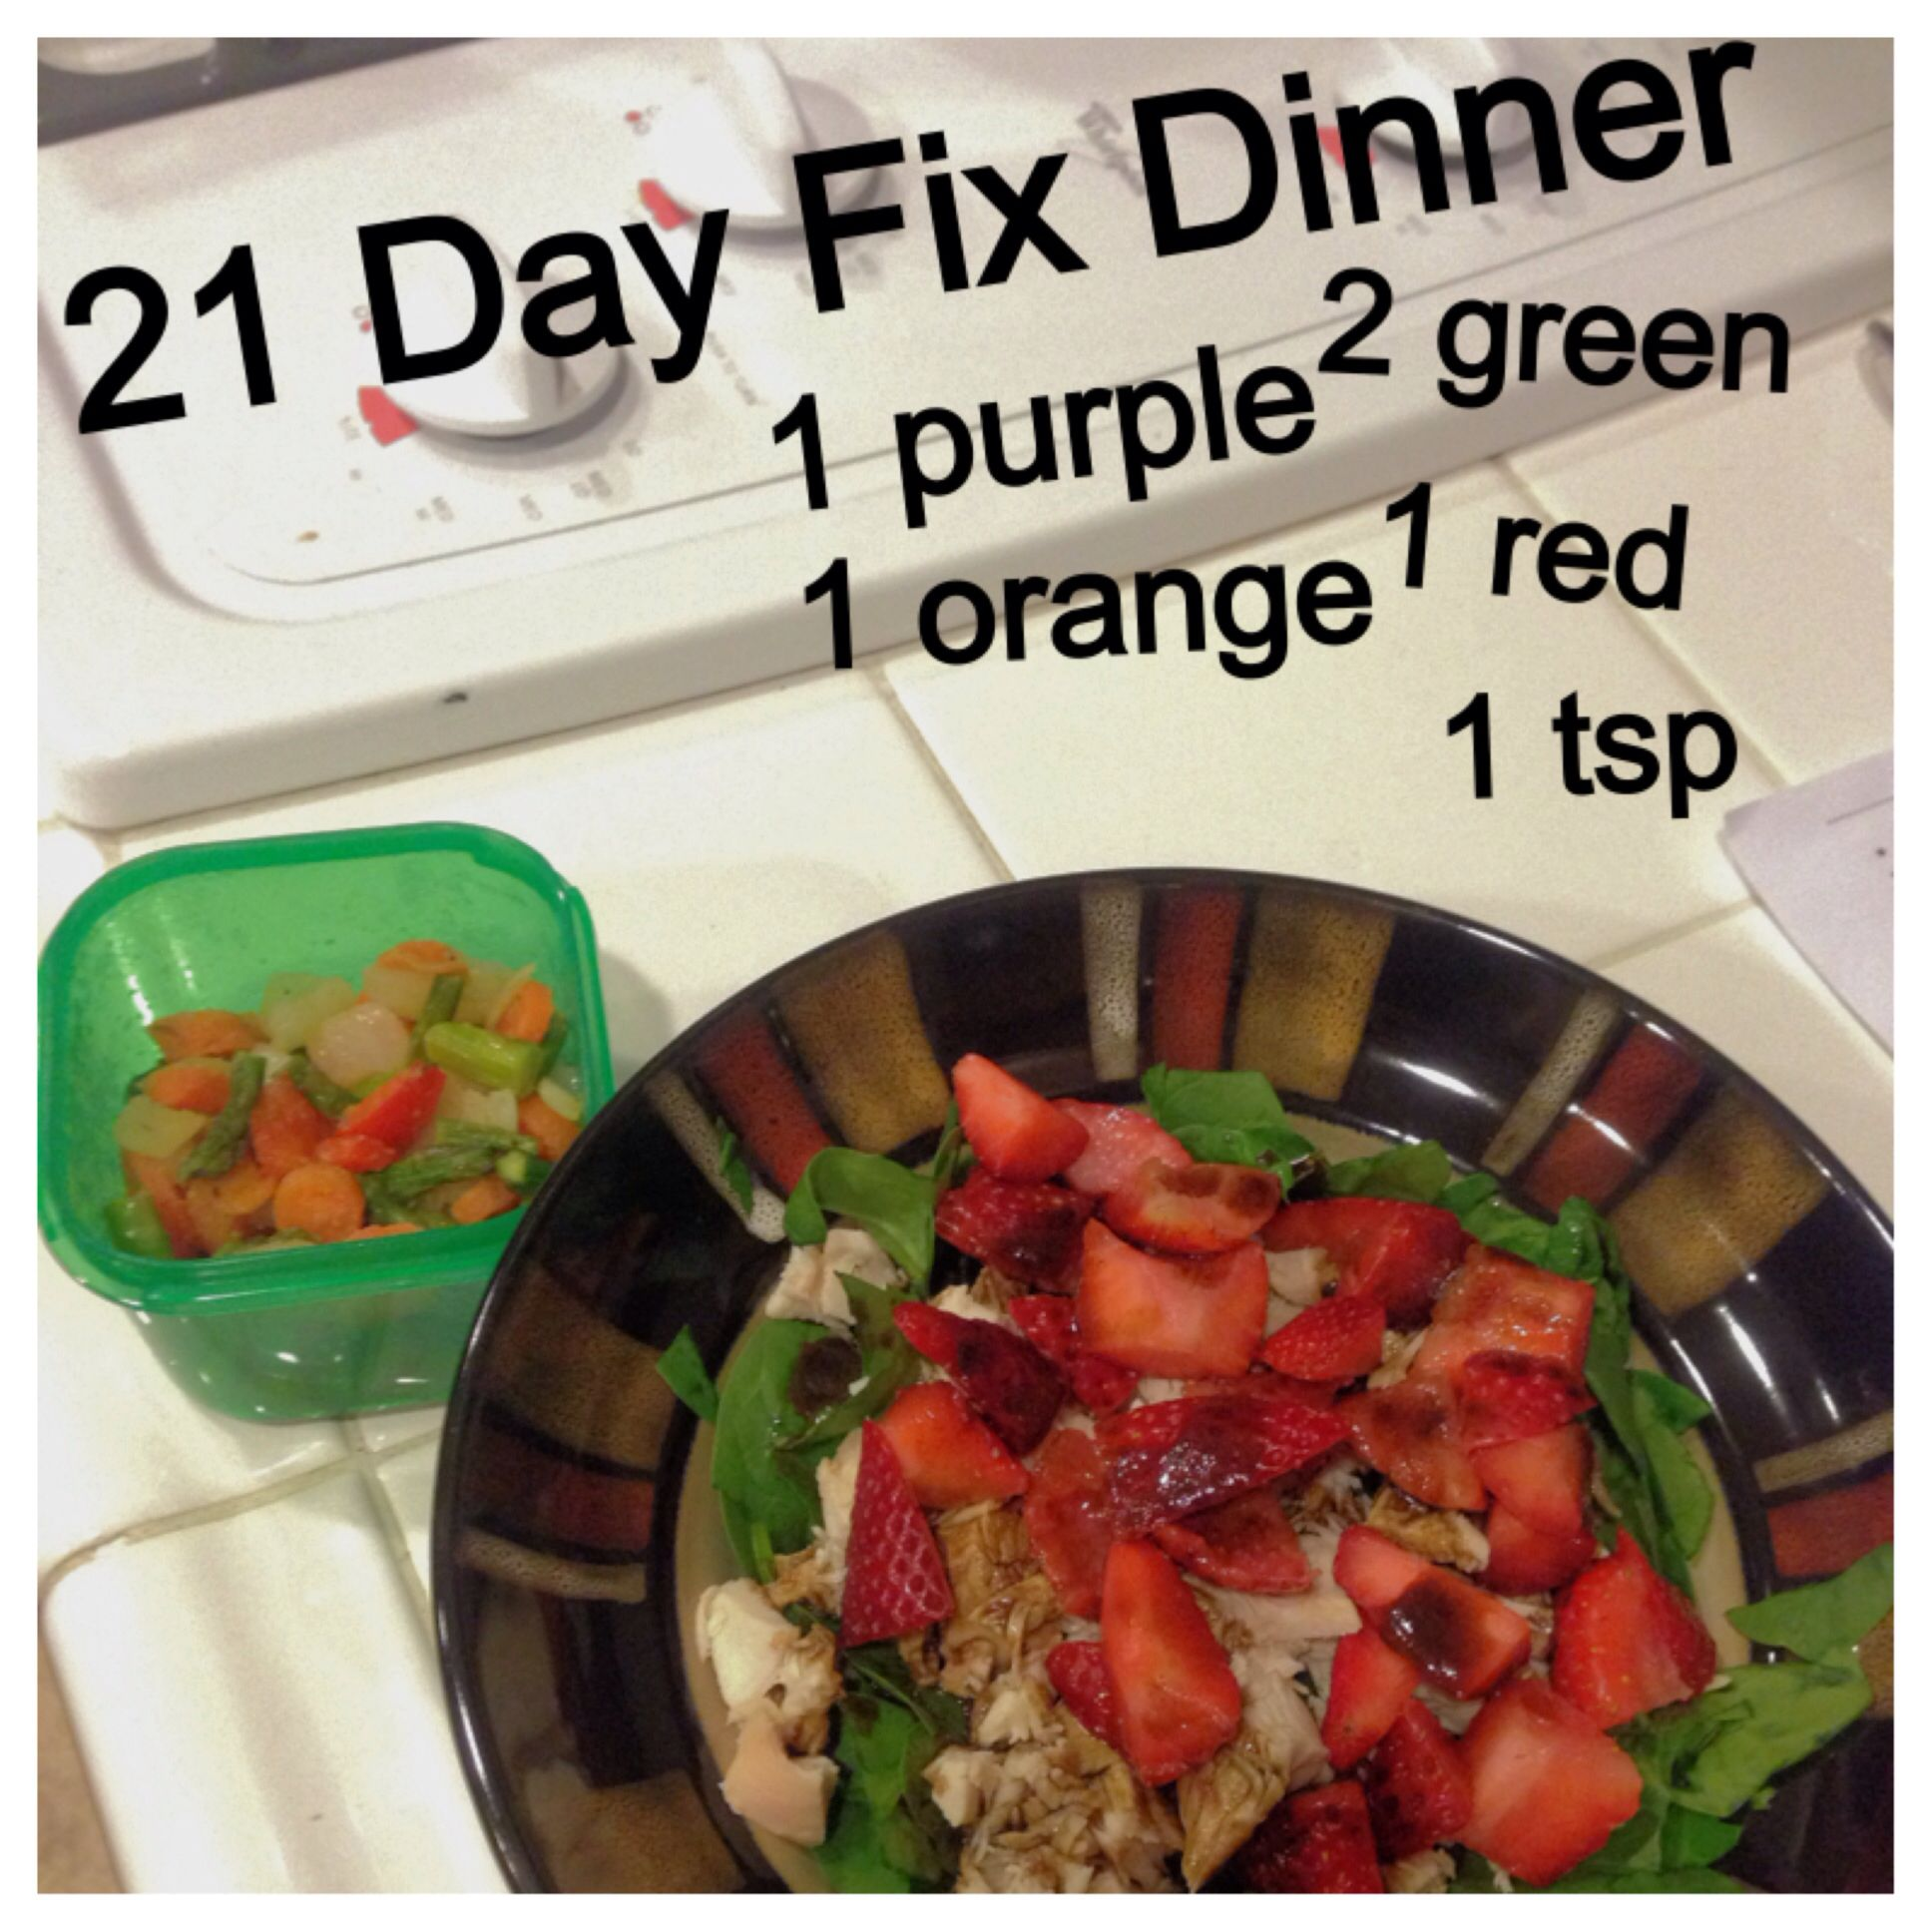 My 21 Day Fix Dinner Mixed Veggie Stir-Fry Recipe -5113